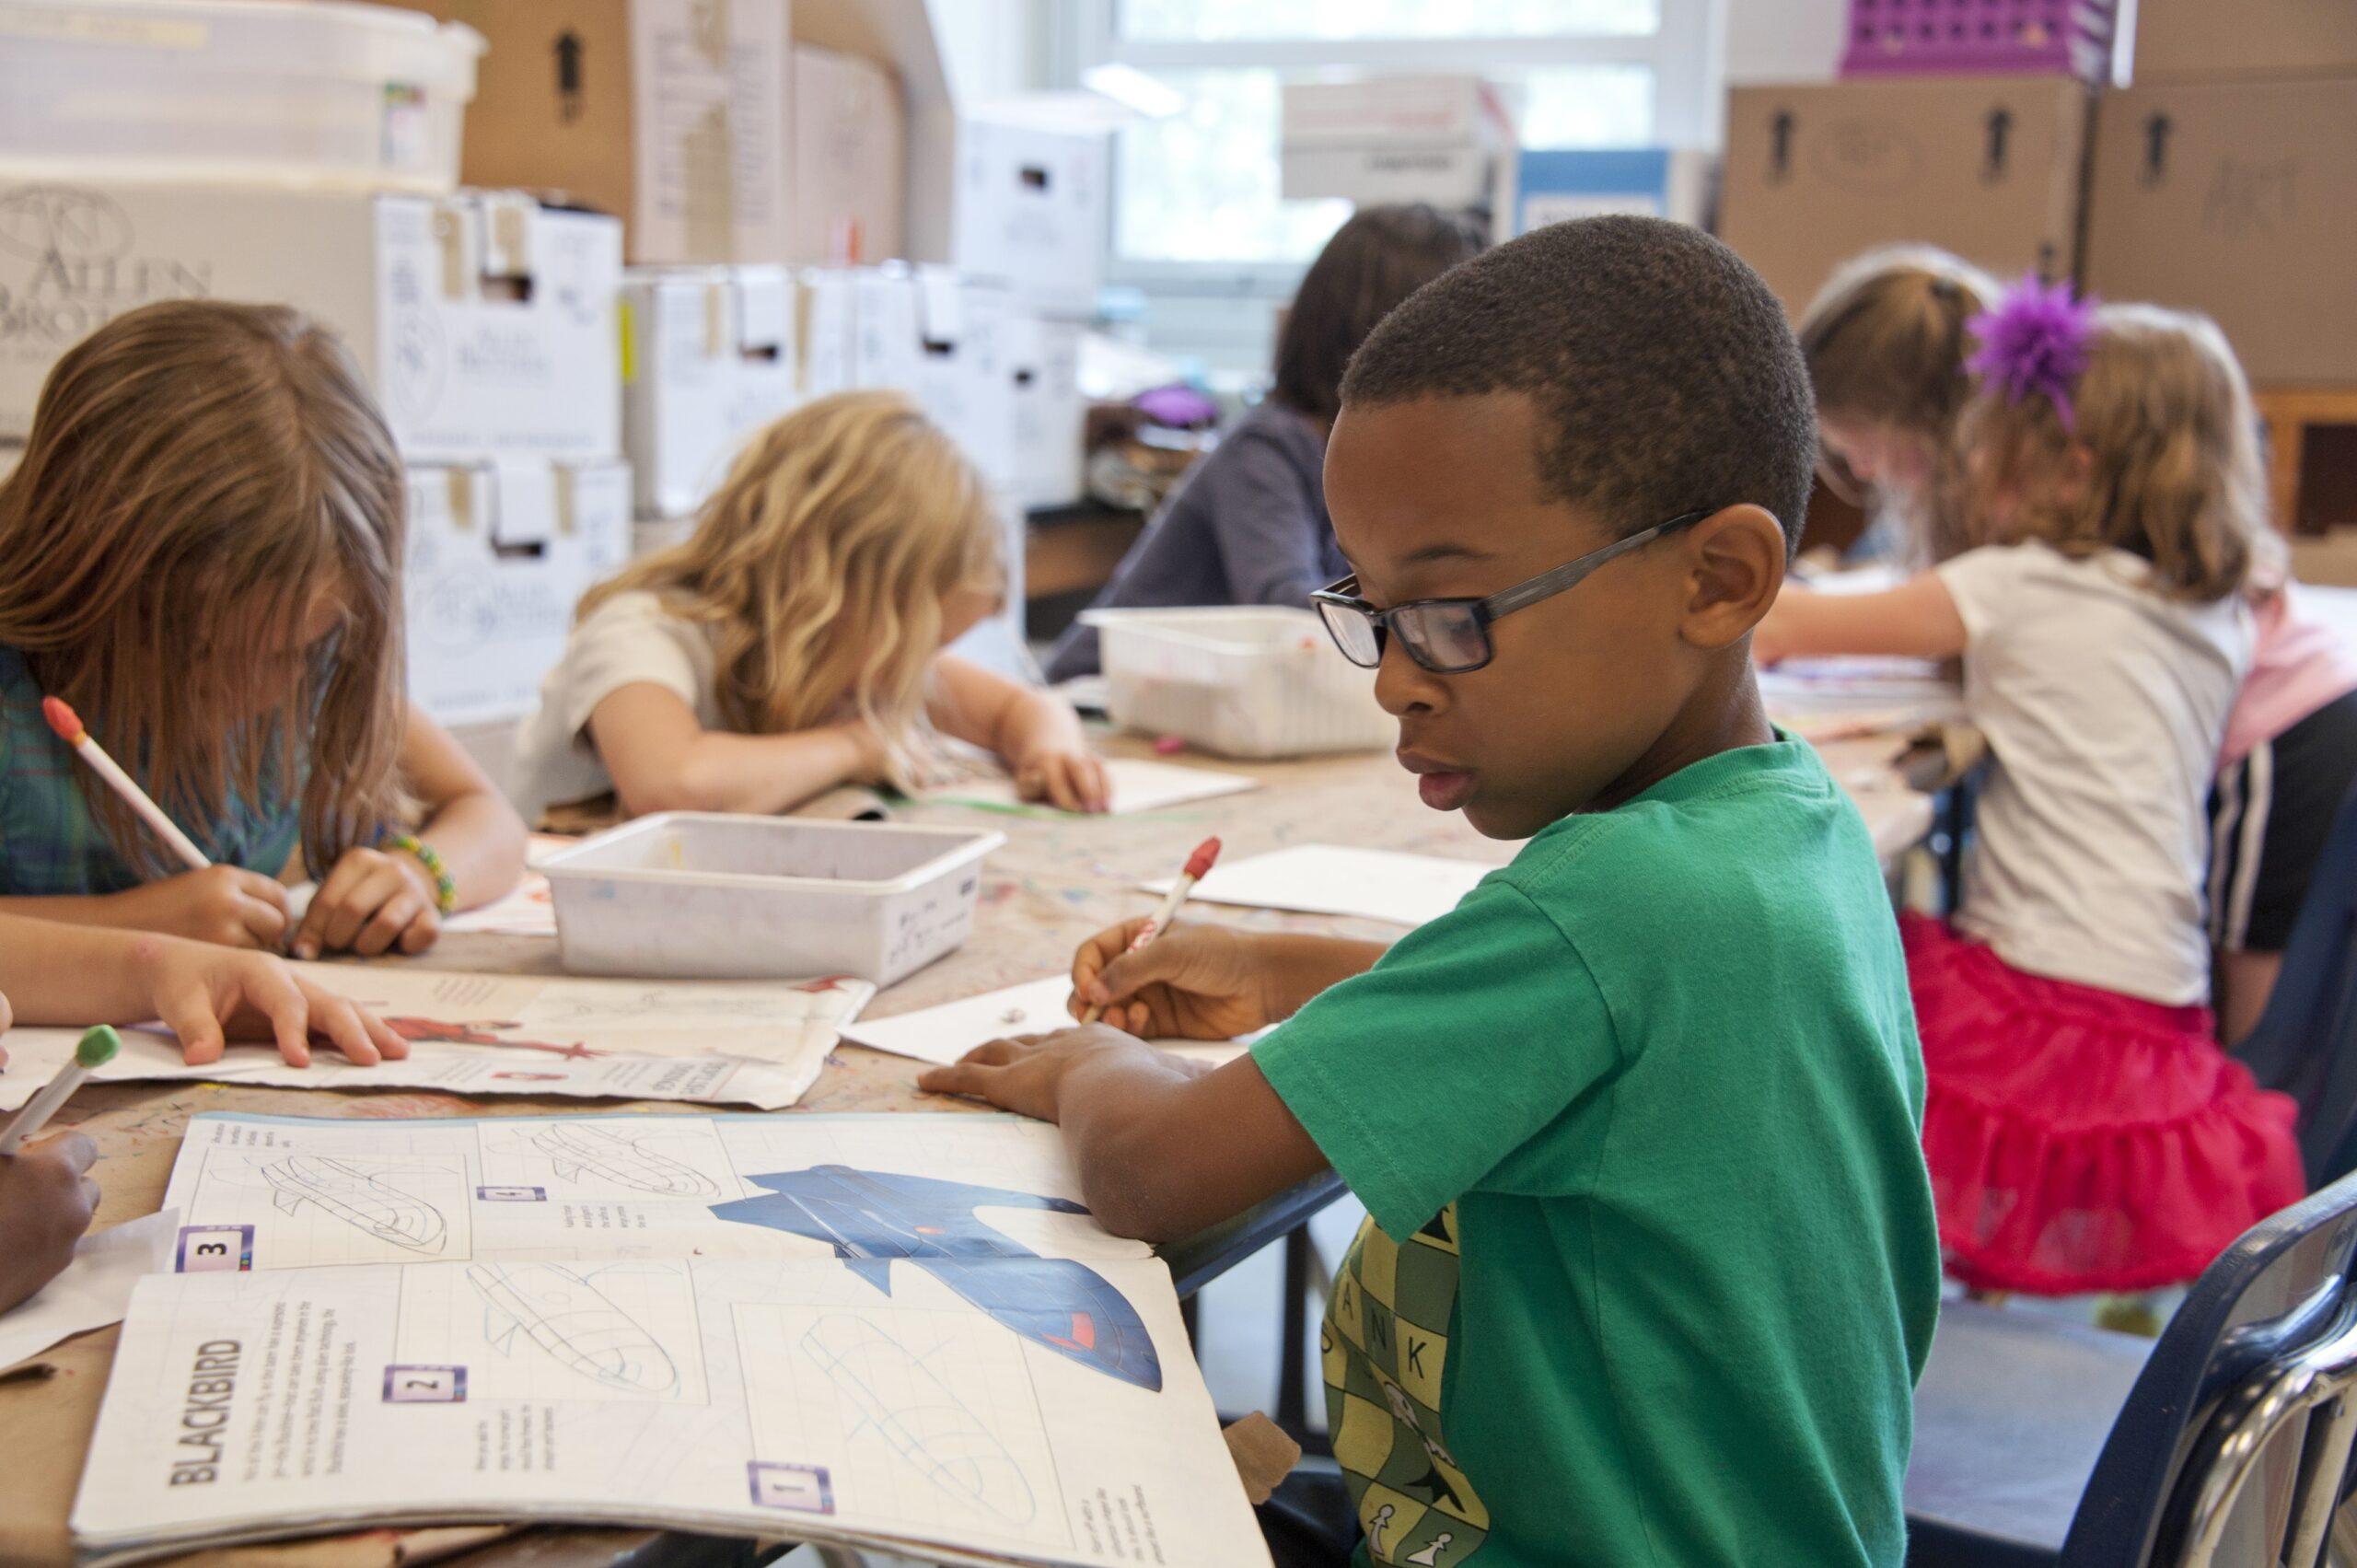 NTC Careers Page: Kids at school